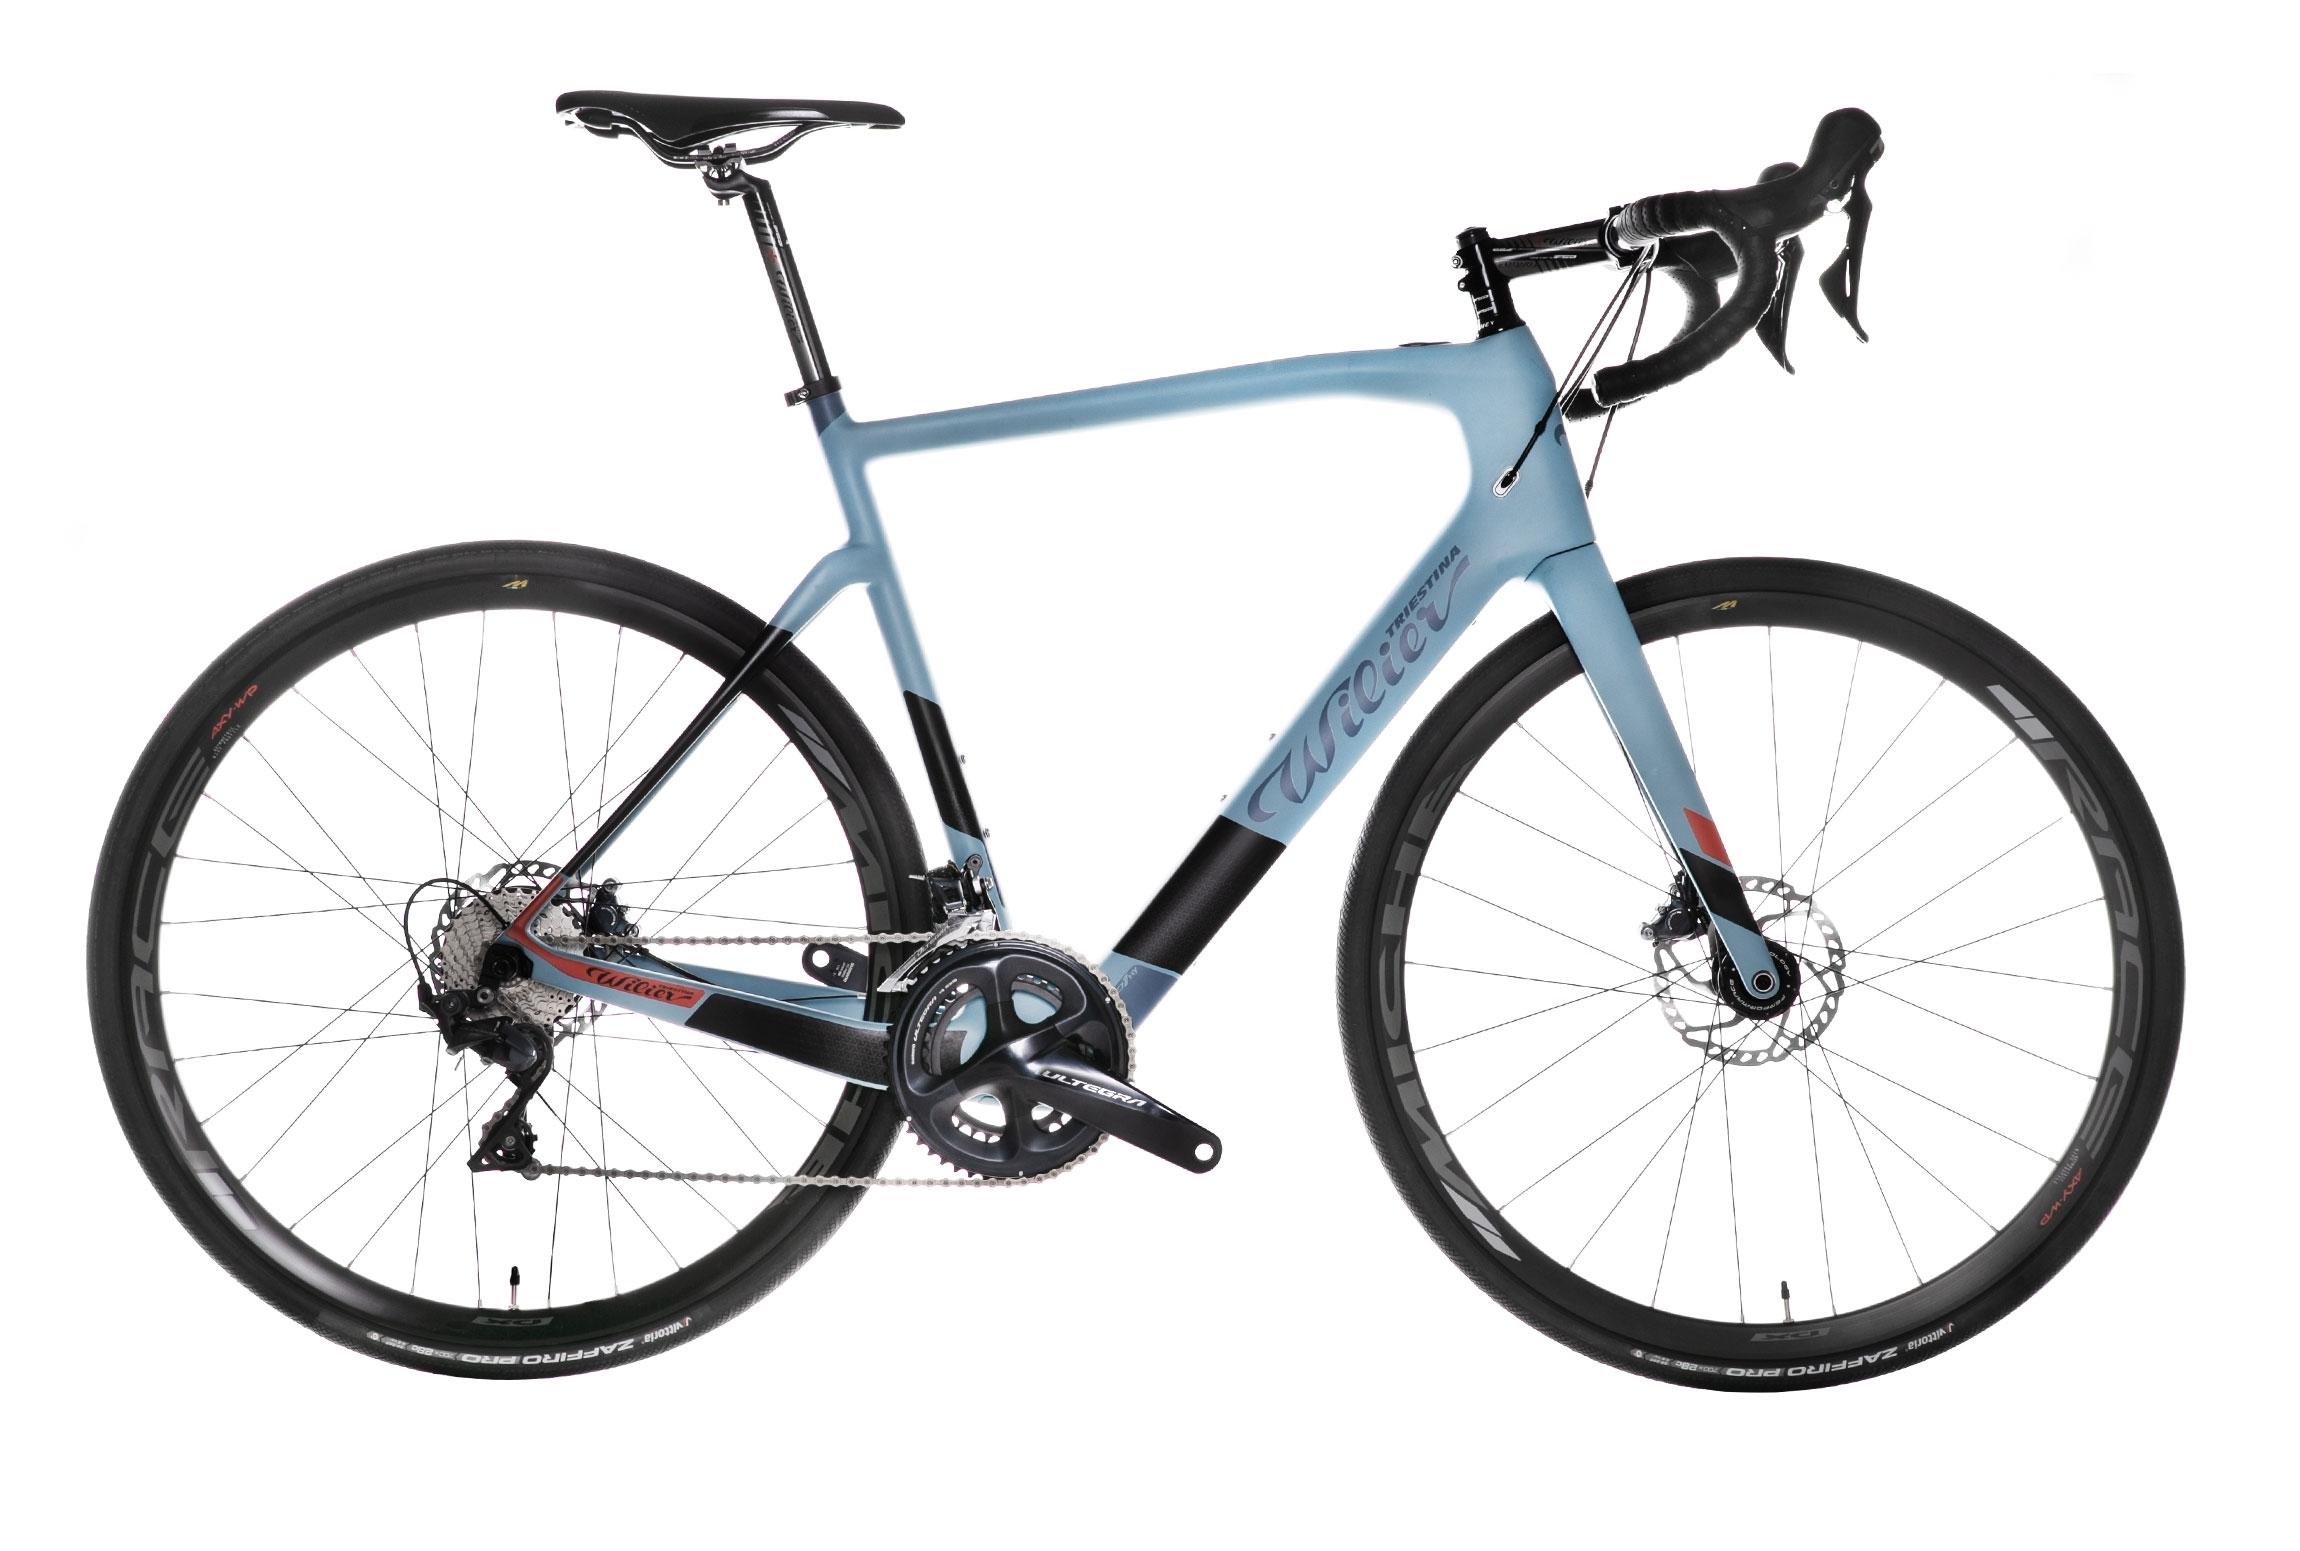 kolo CENTO1HY + ULTEGRA R8020 + MICHE blue black M